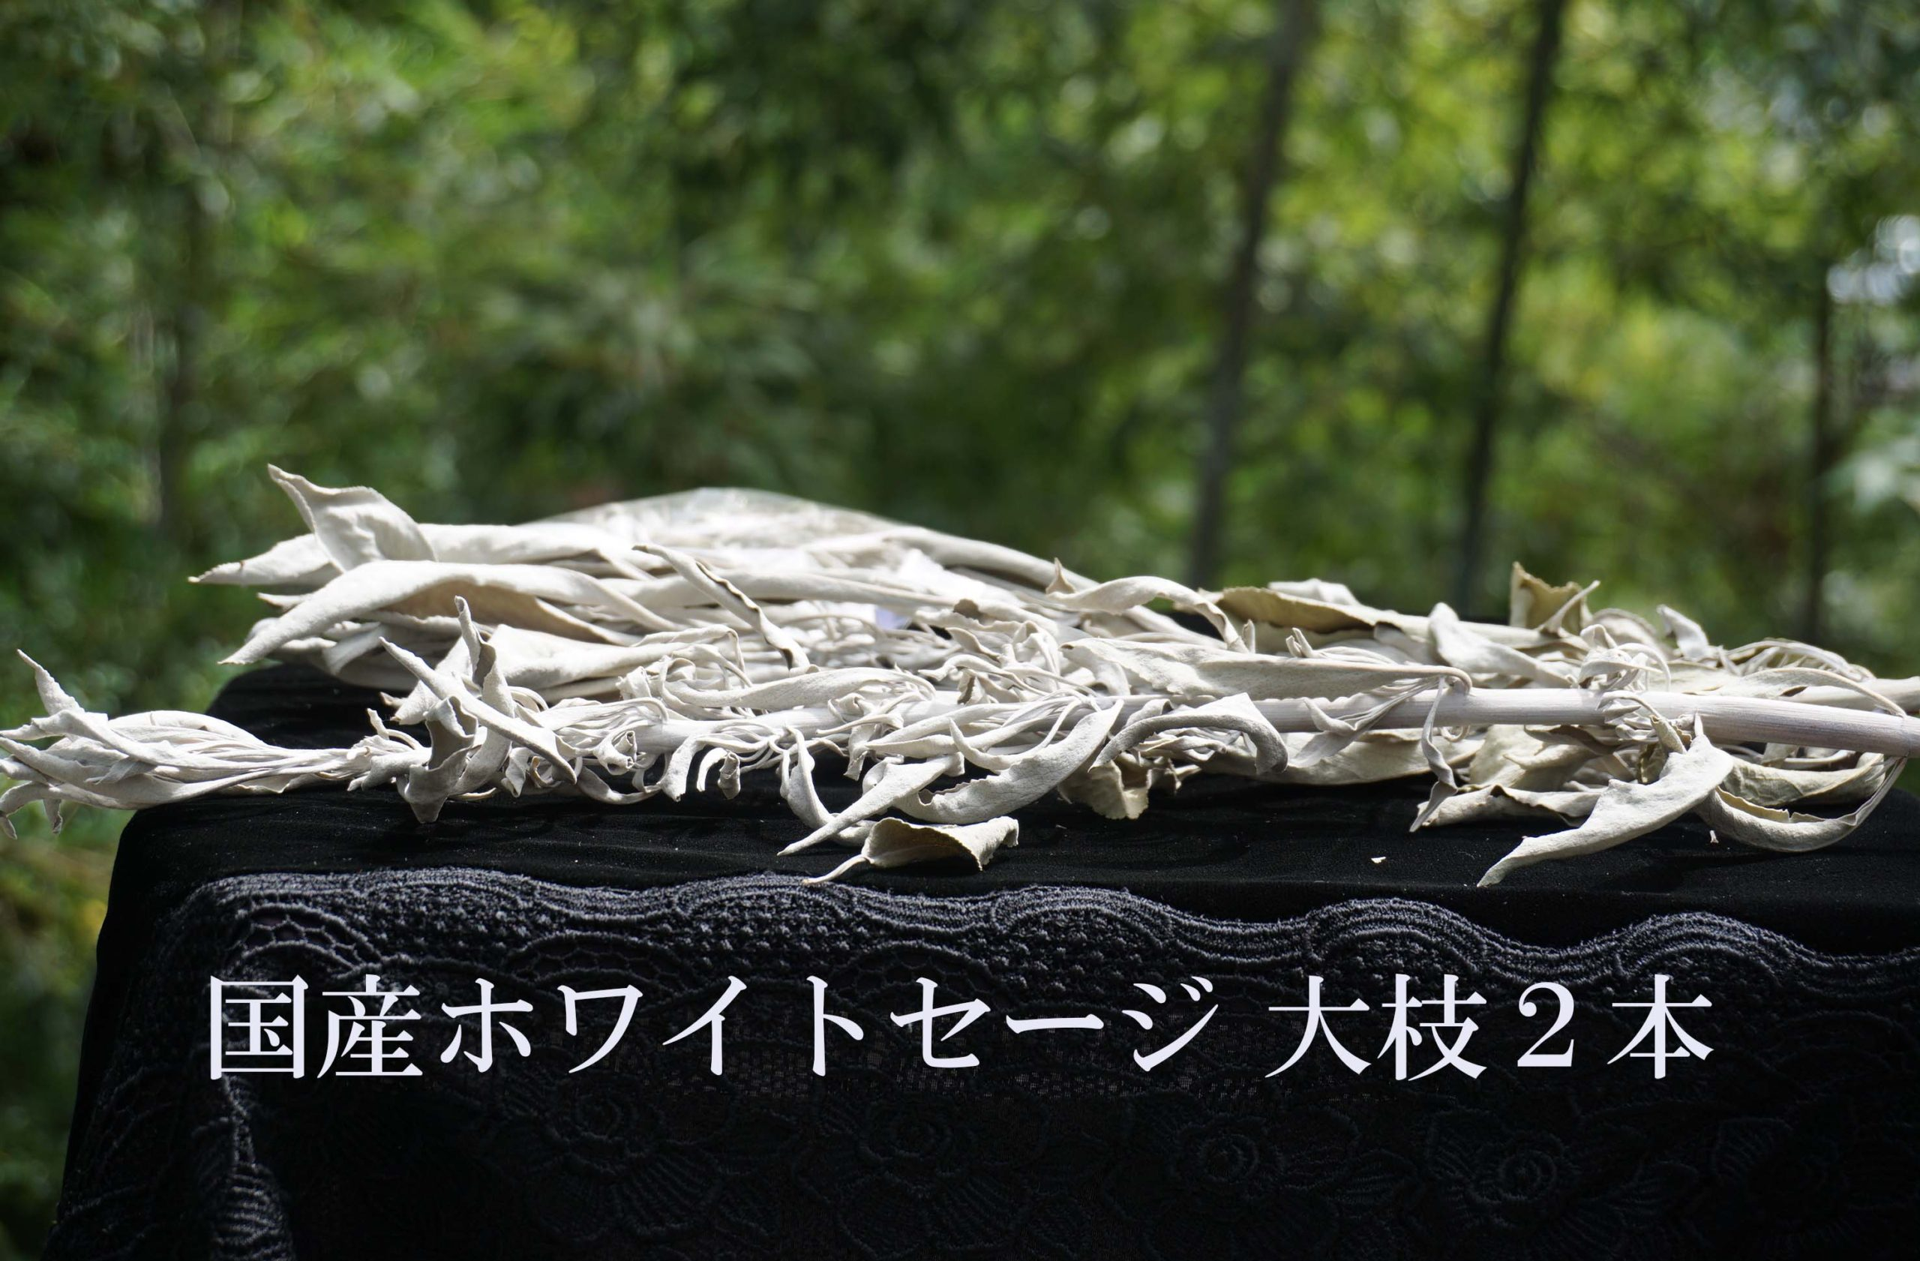 white-sage-kokusan-i02